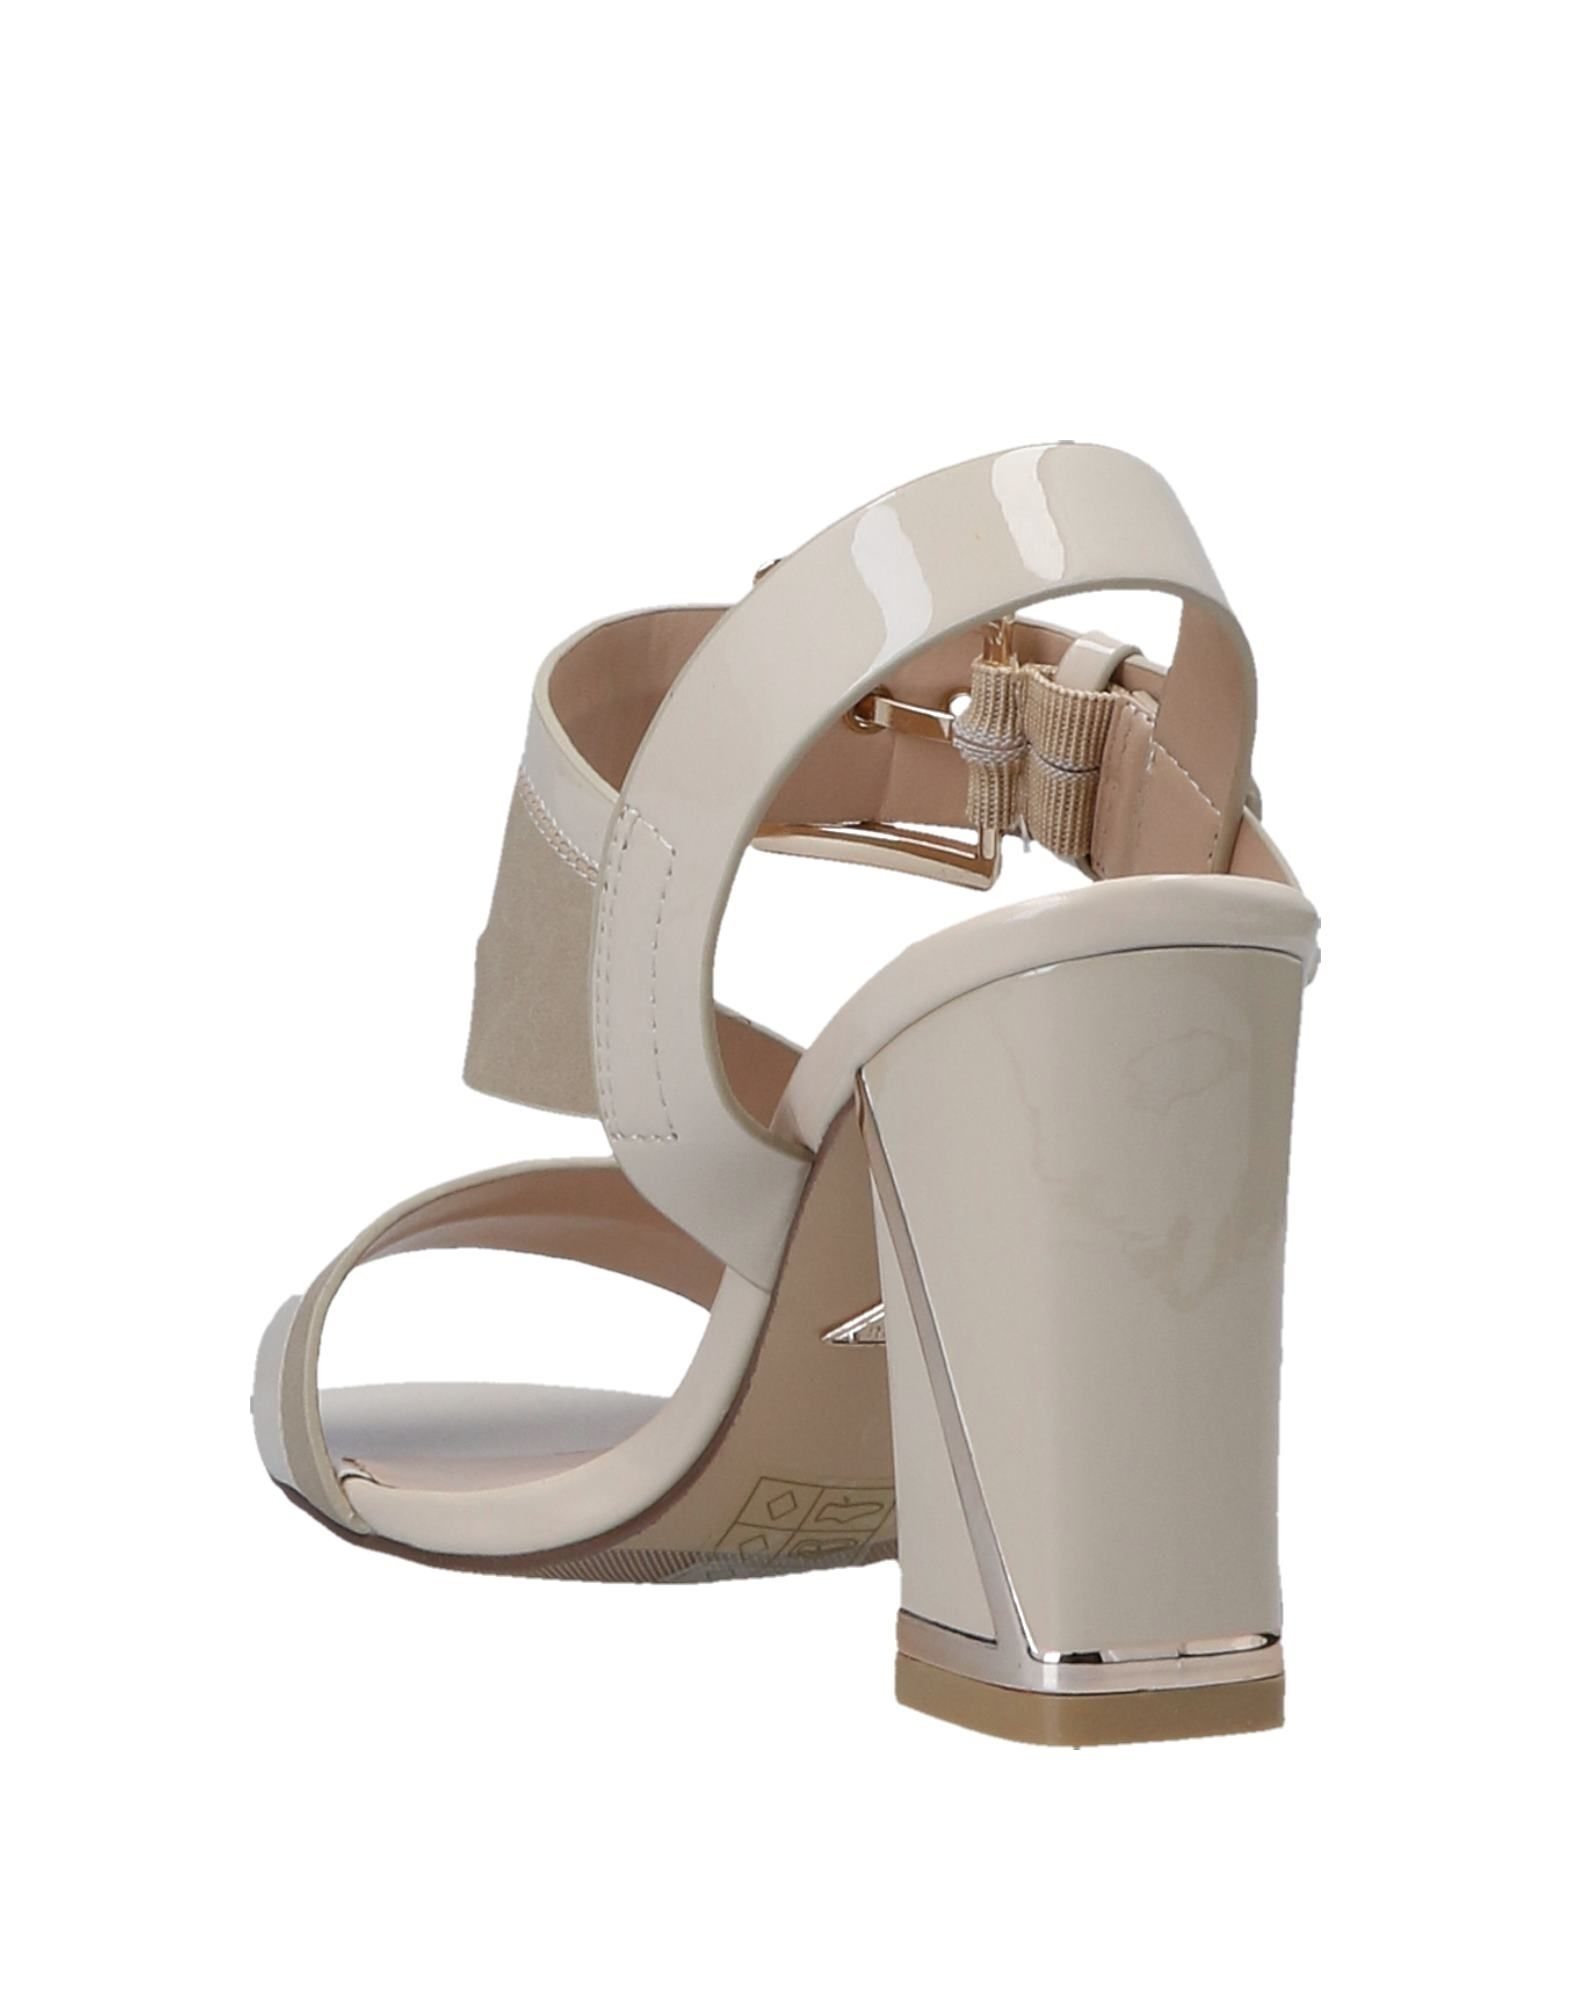 Laura Biagiotti Sandalen Qualität Damen  11556528EK Gute Qualität Sandalen beliebte Schuhe f168a8